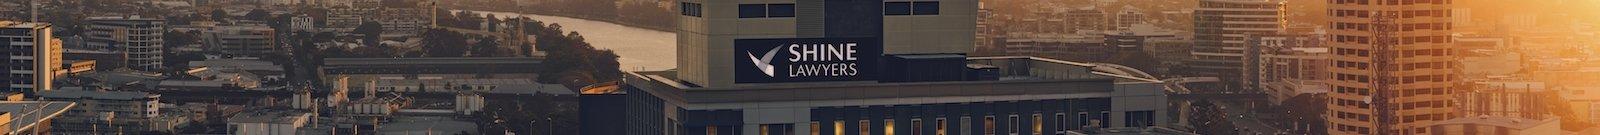 bad financial advice | Shine Lawyers